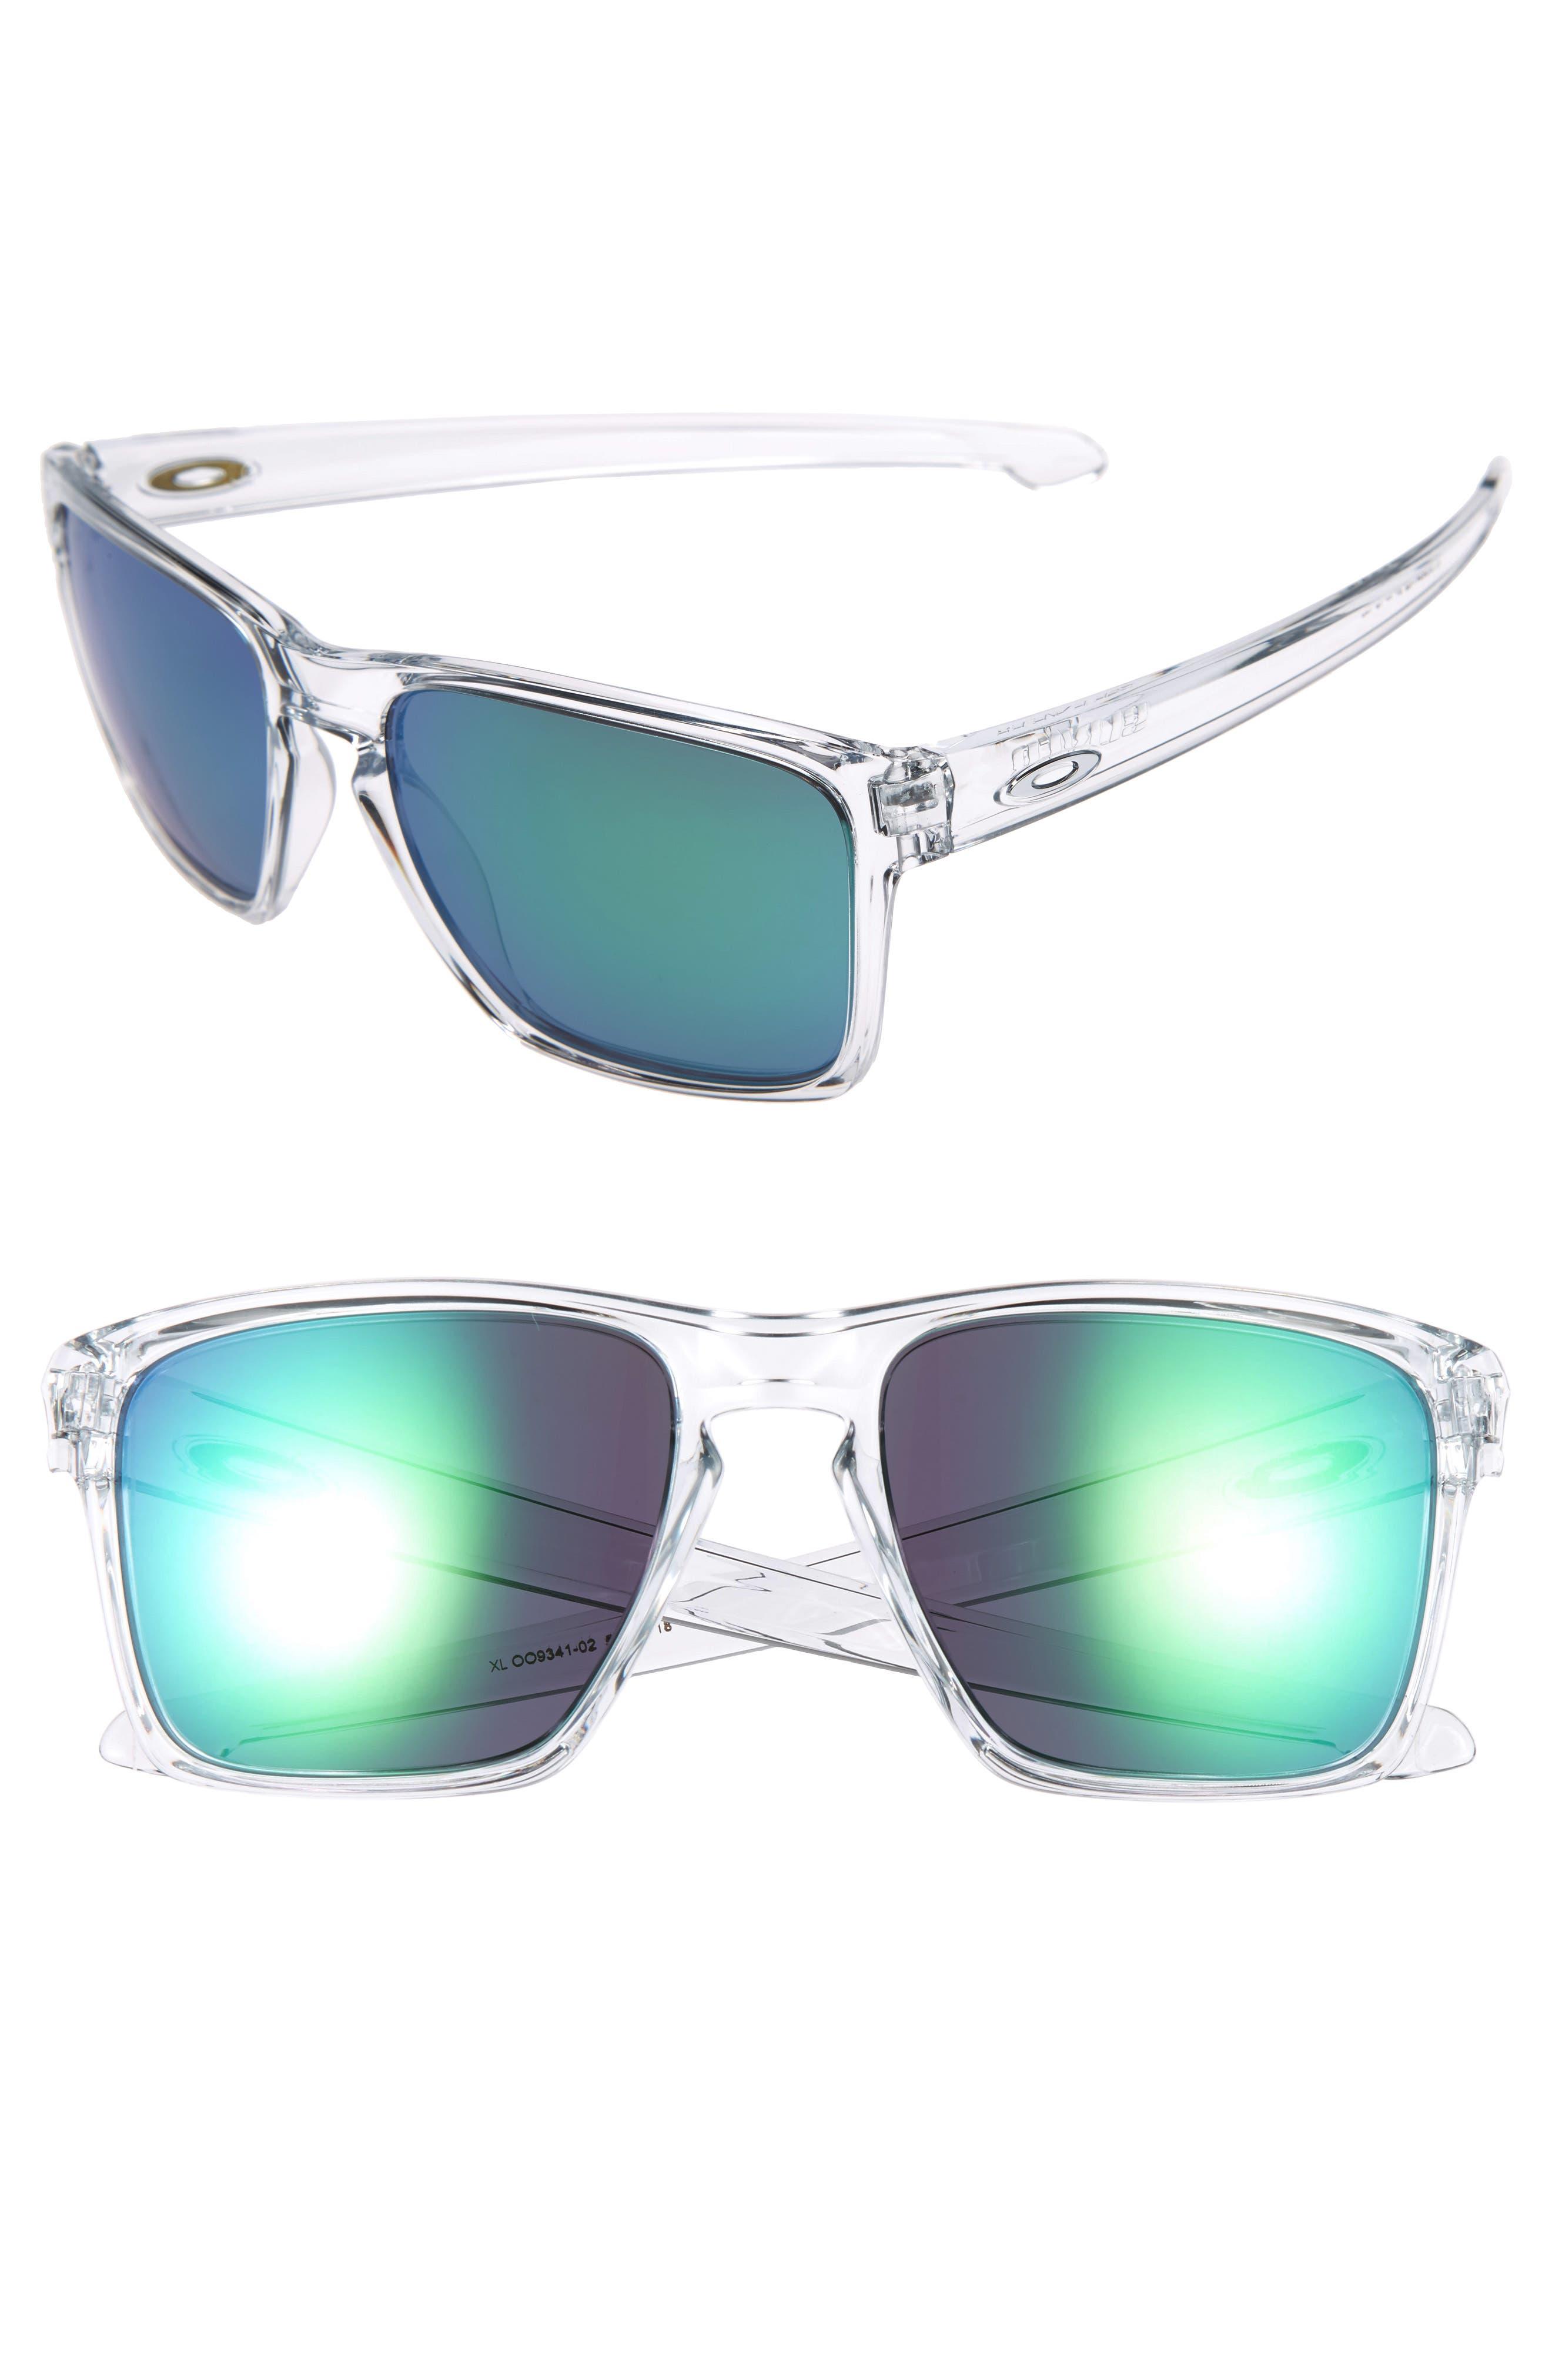 Sliver XL 57mm Sunglasses,                             Main thumbnail 1, color,                             101